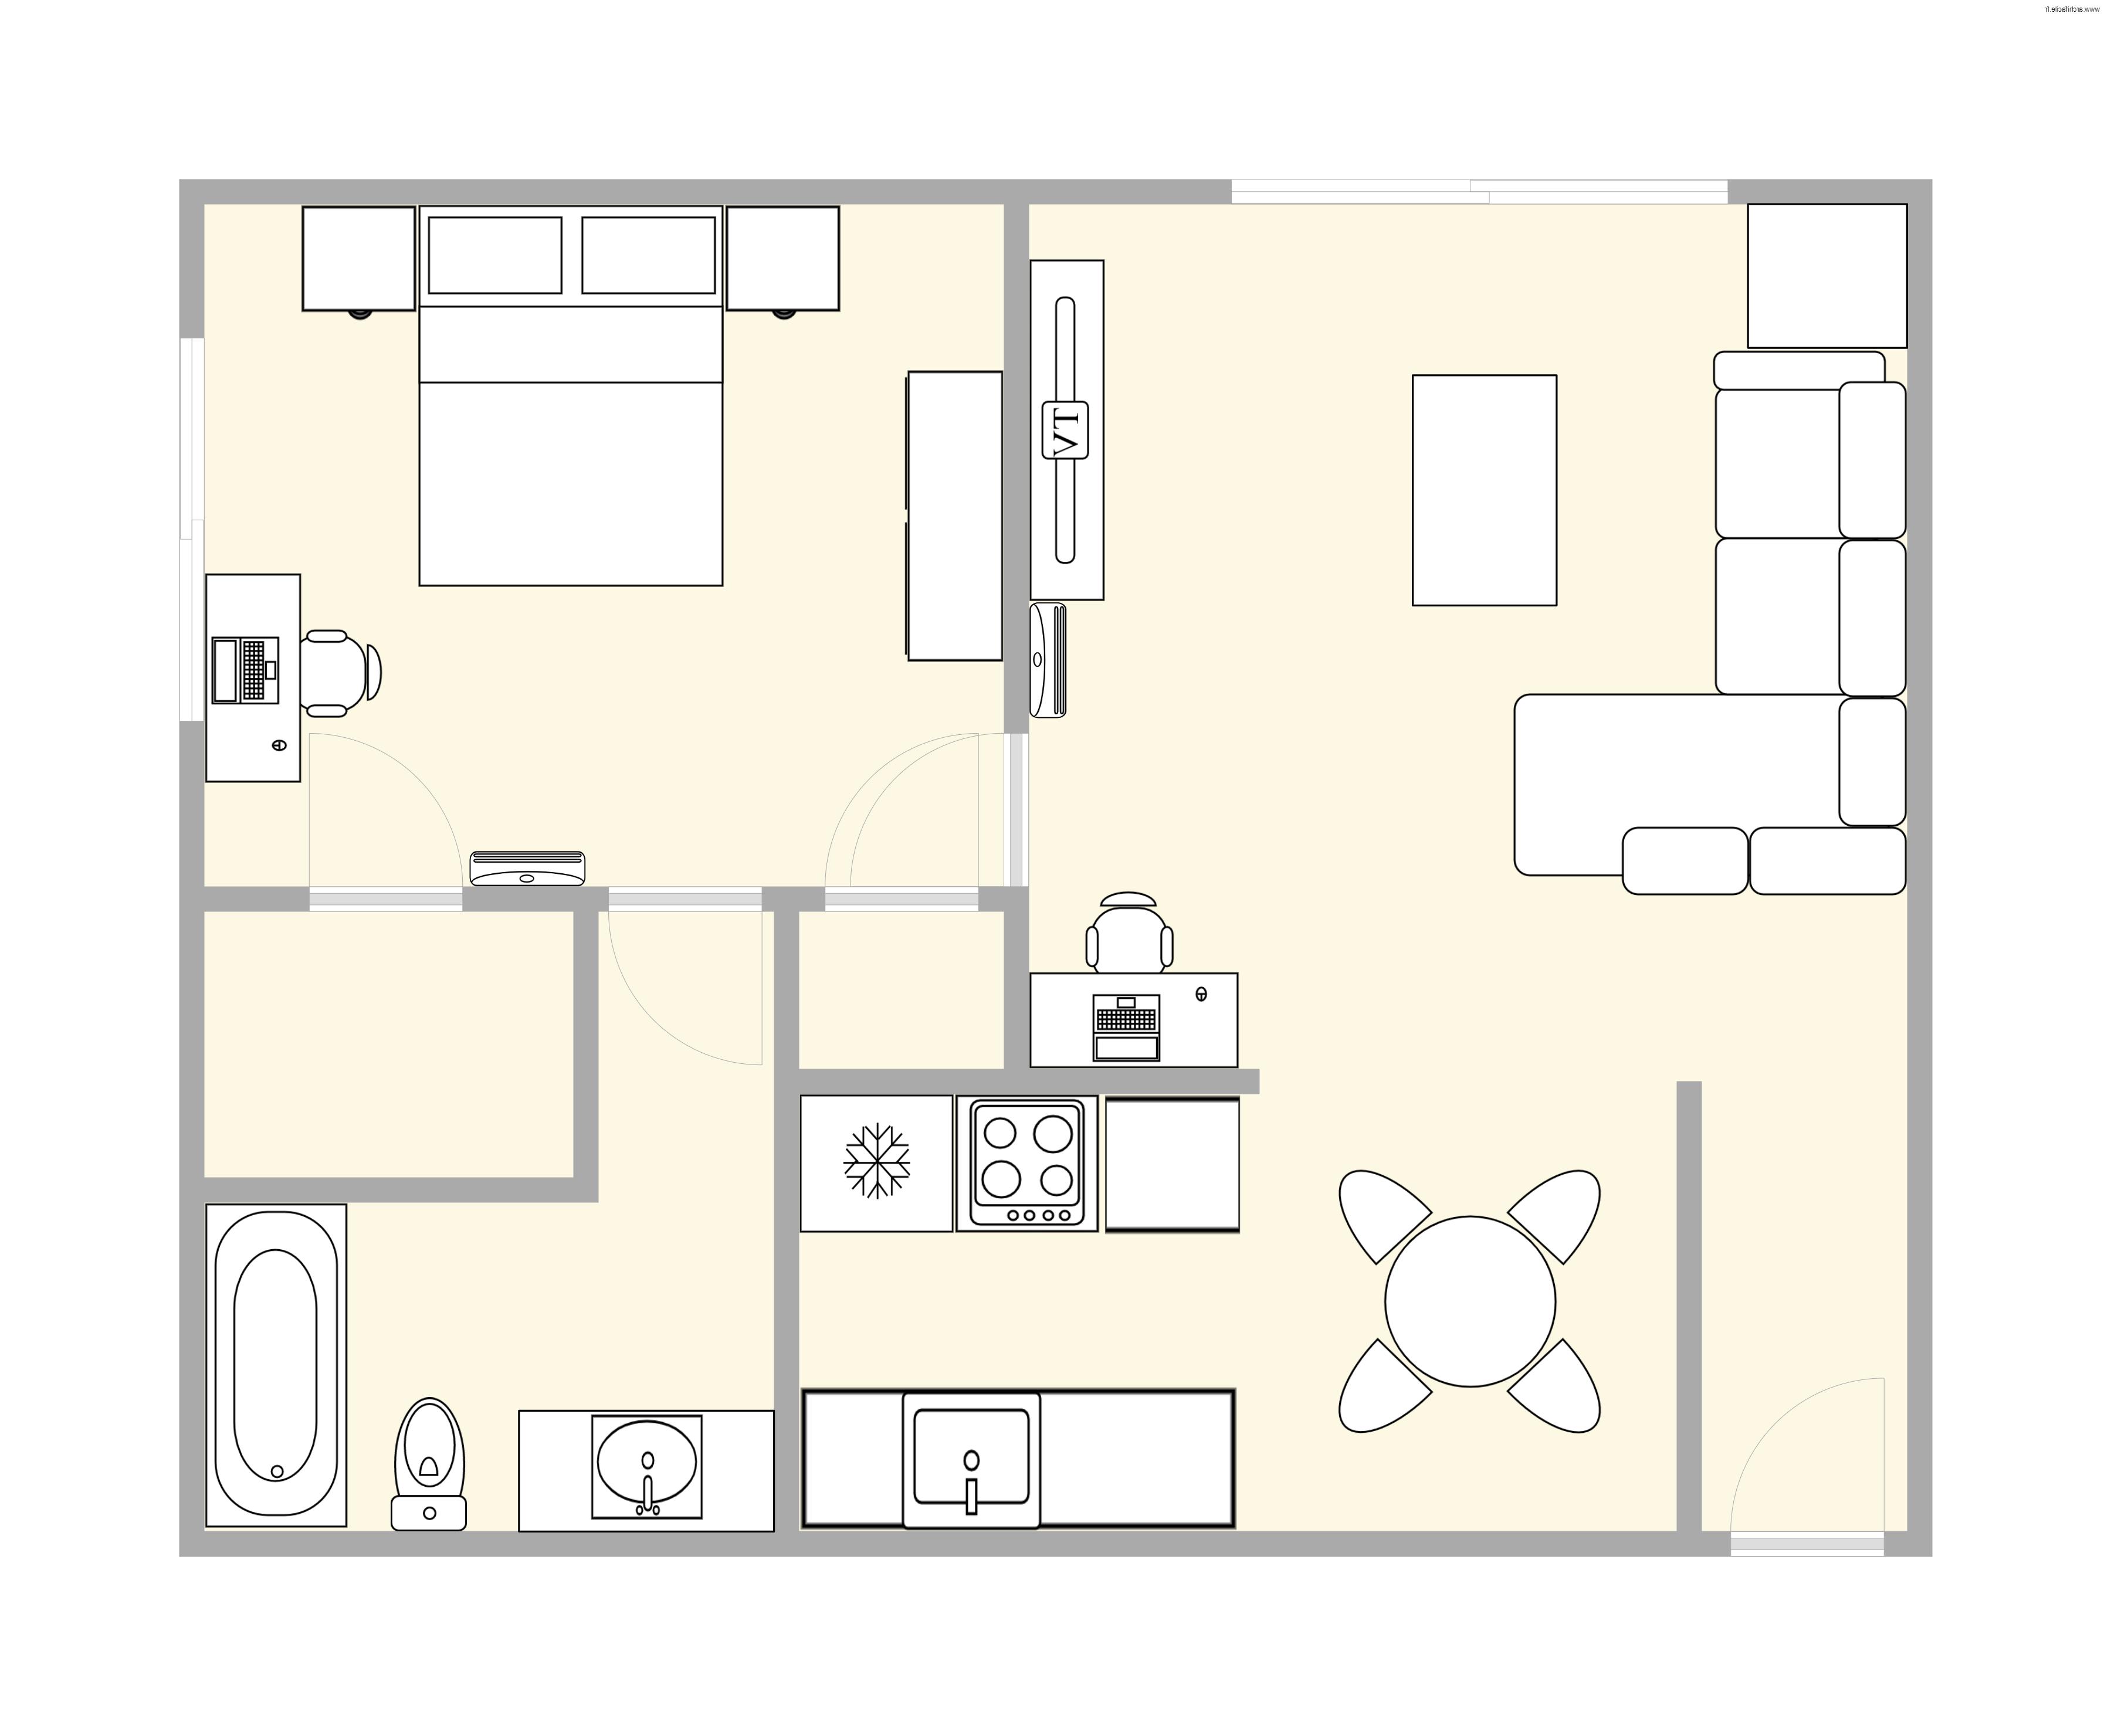 Floorplan (furniture not included)